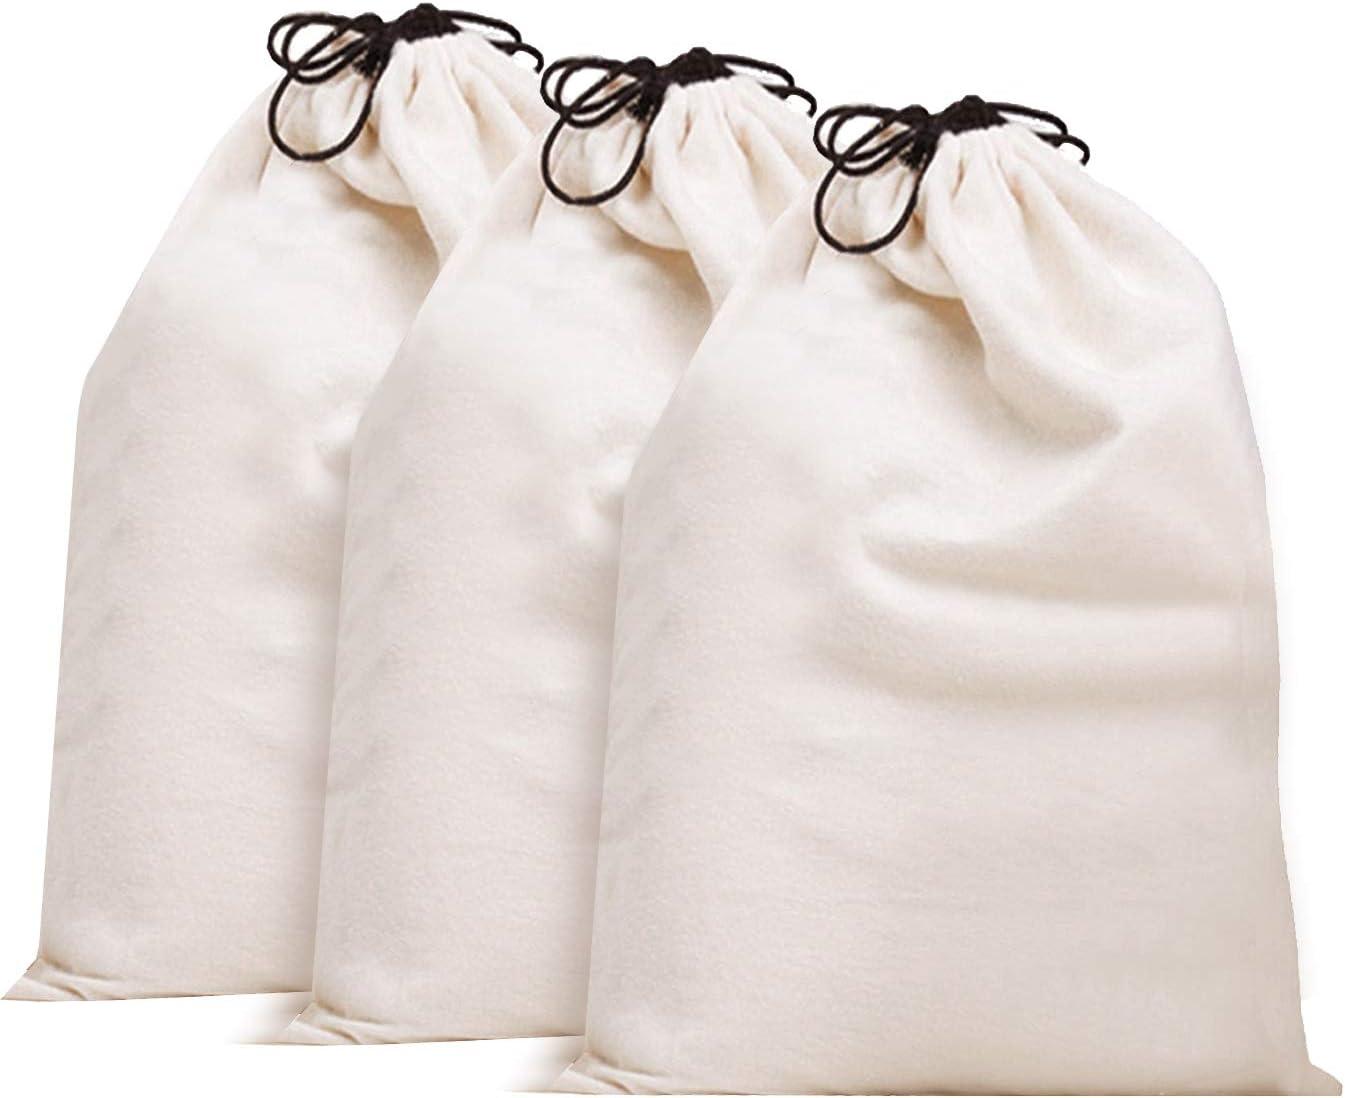 Misslo Cotton Breathable Dust-proof Drawstring Storage Pouch Bag (Pack 3 L)